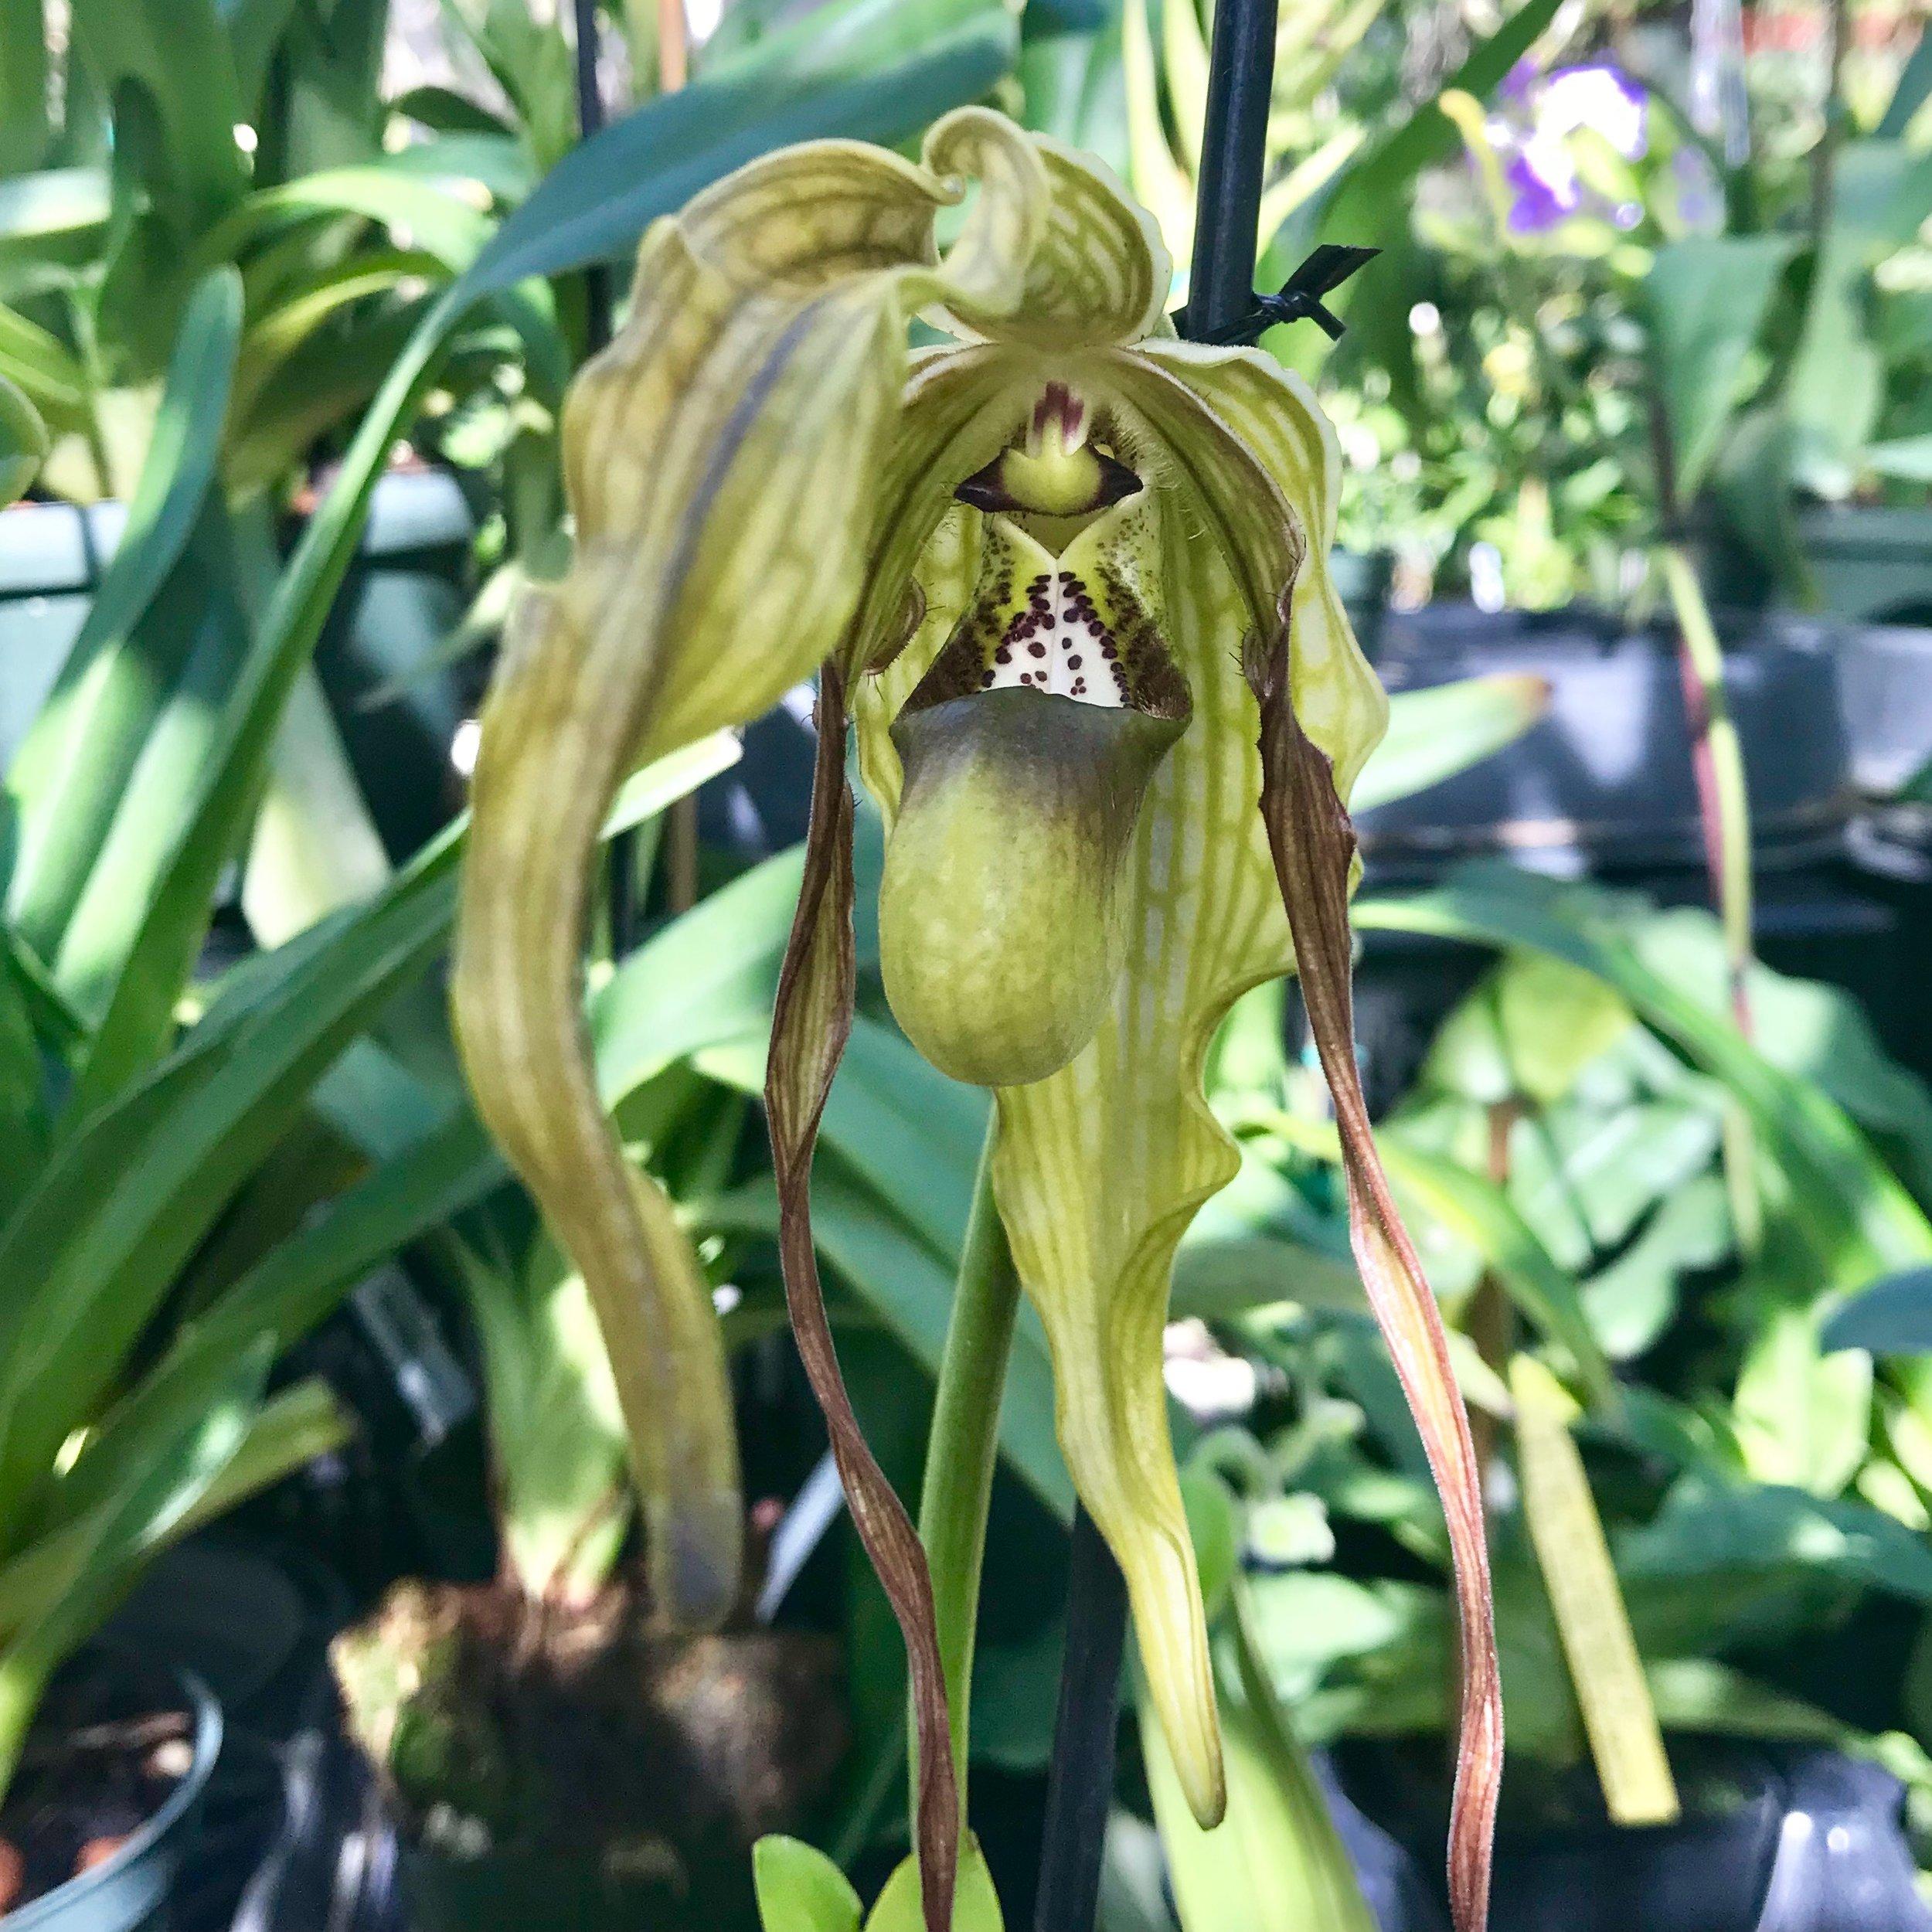 phrag caudatum lady slipper species palmer orchids